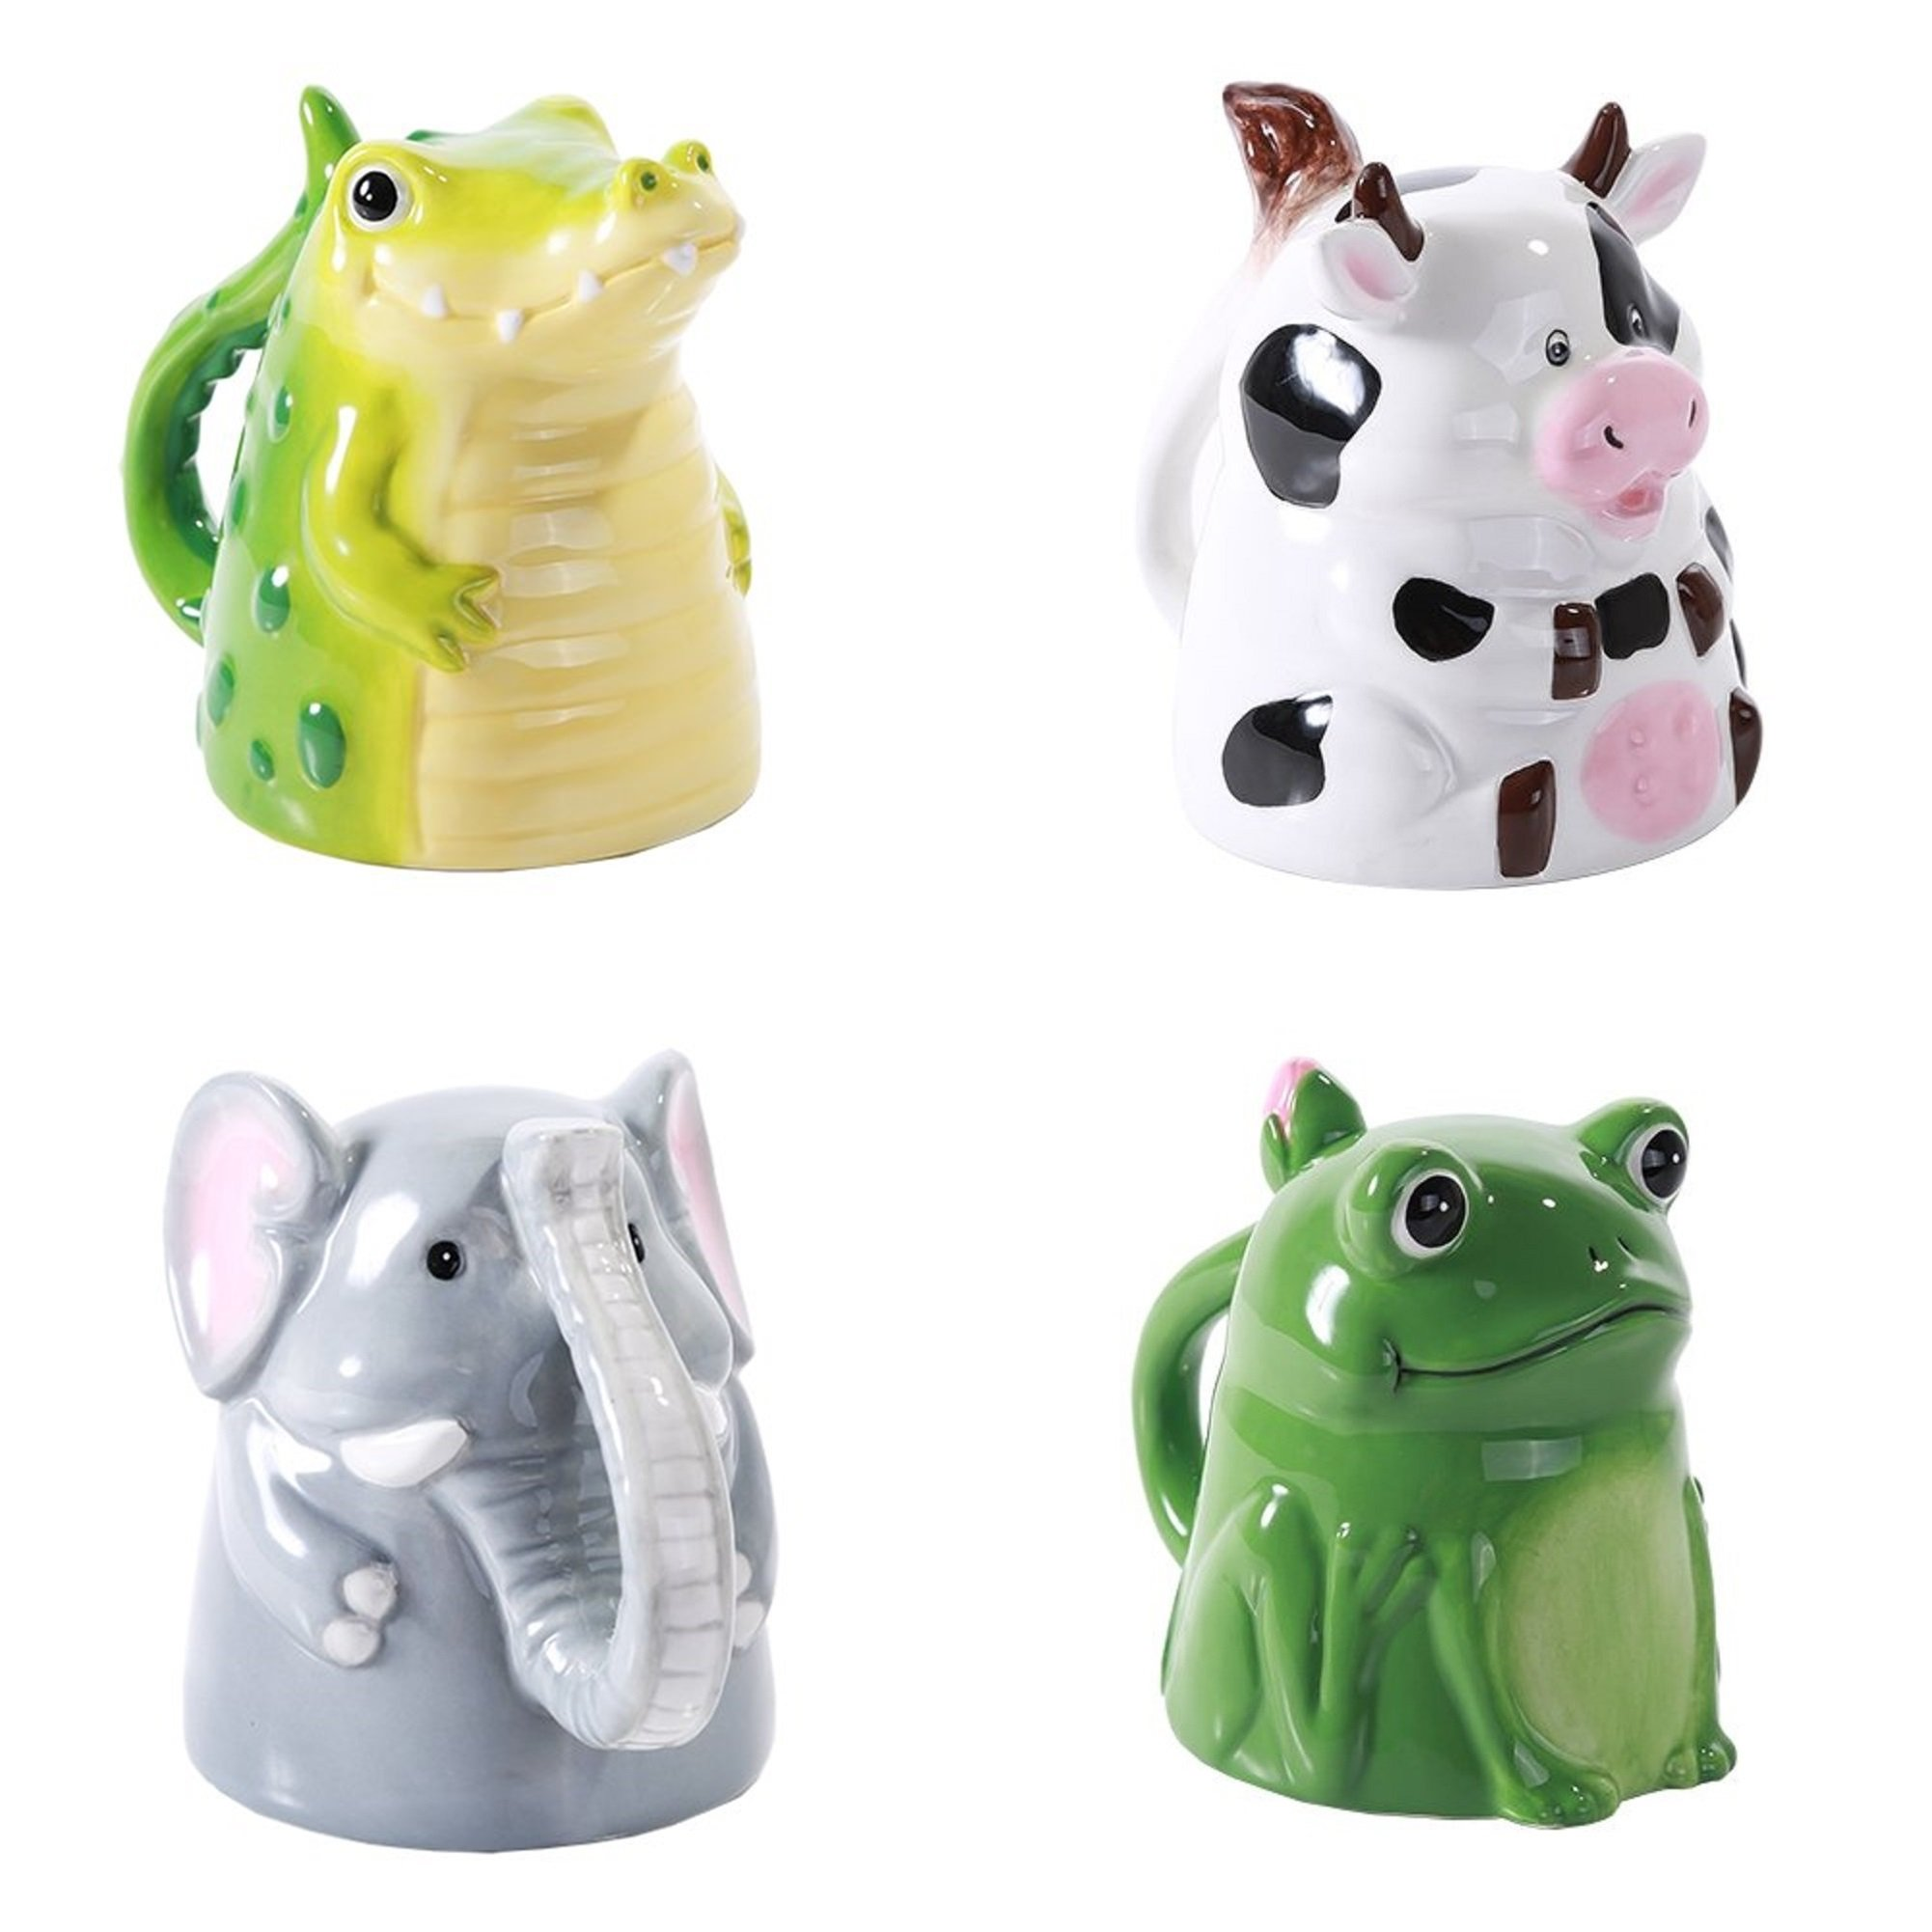 Topsy Turvy Upside Down Ceramic Porcelain Animal Coffee Mug Set, Cow Elephant Frog and Alligator